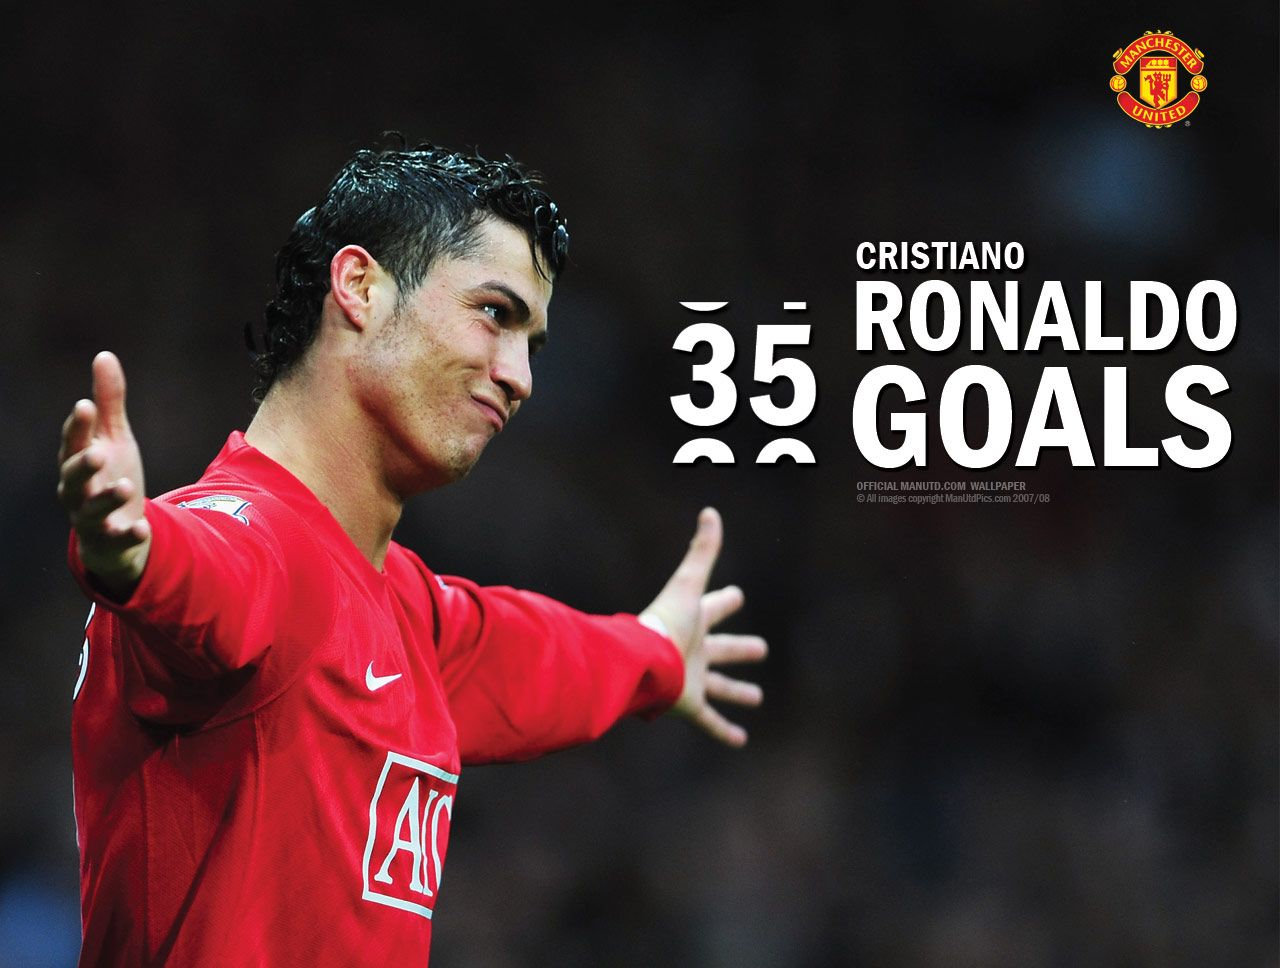 http://2.bp.blogspot.com/-q4vRtMGhQaY/TYDLEiVpuqI/AAAAAAAAB2c/fBzvqqmCgBg/s1600/Cristiano_Ronaldo-manchester-35_goal.jpg